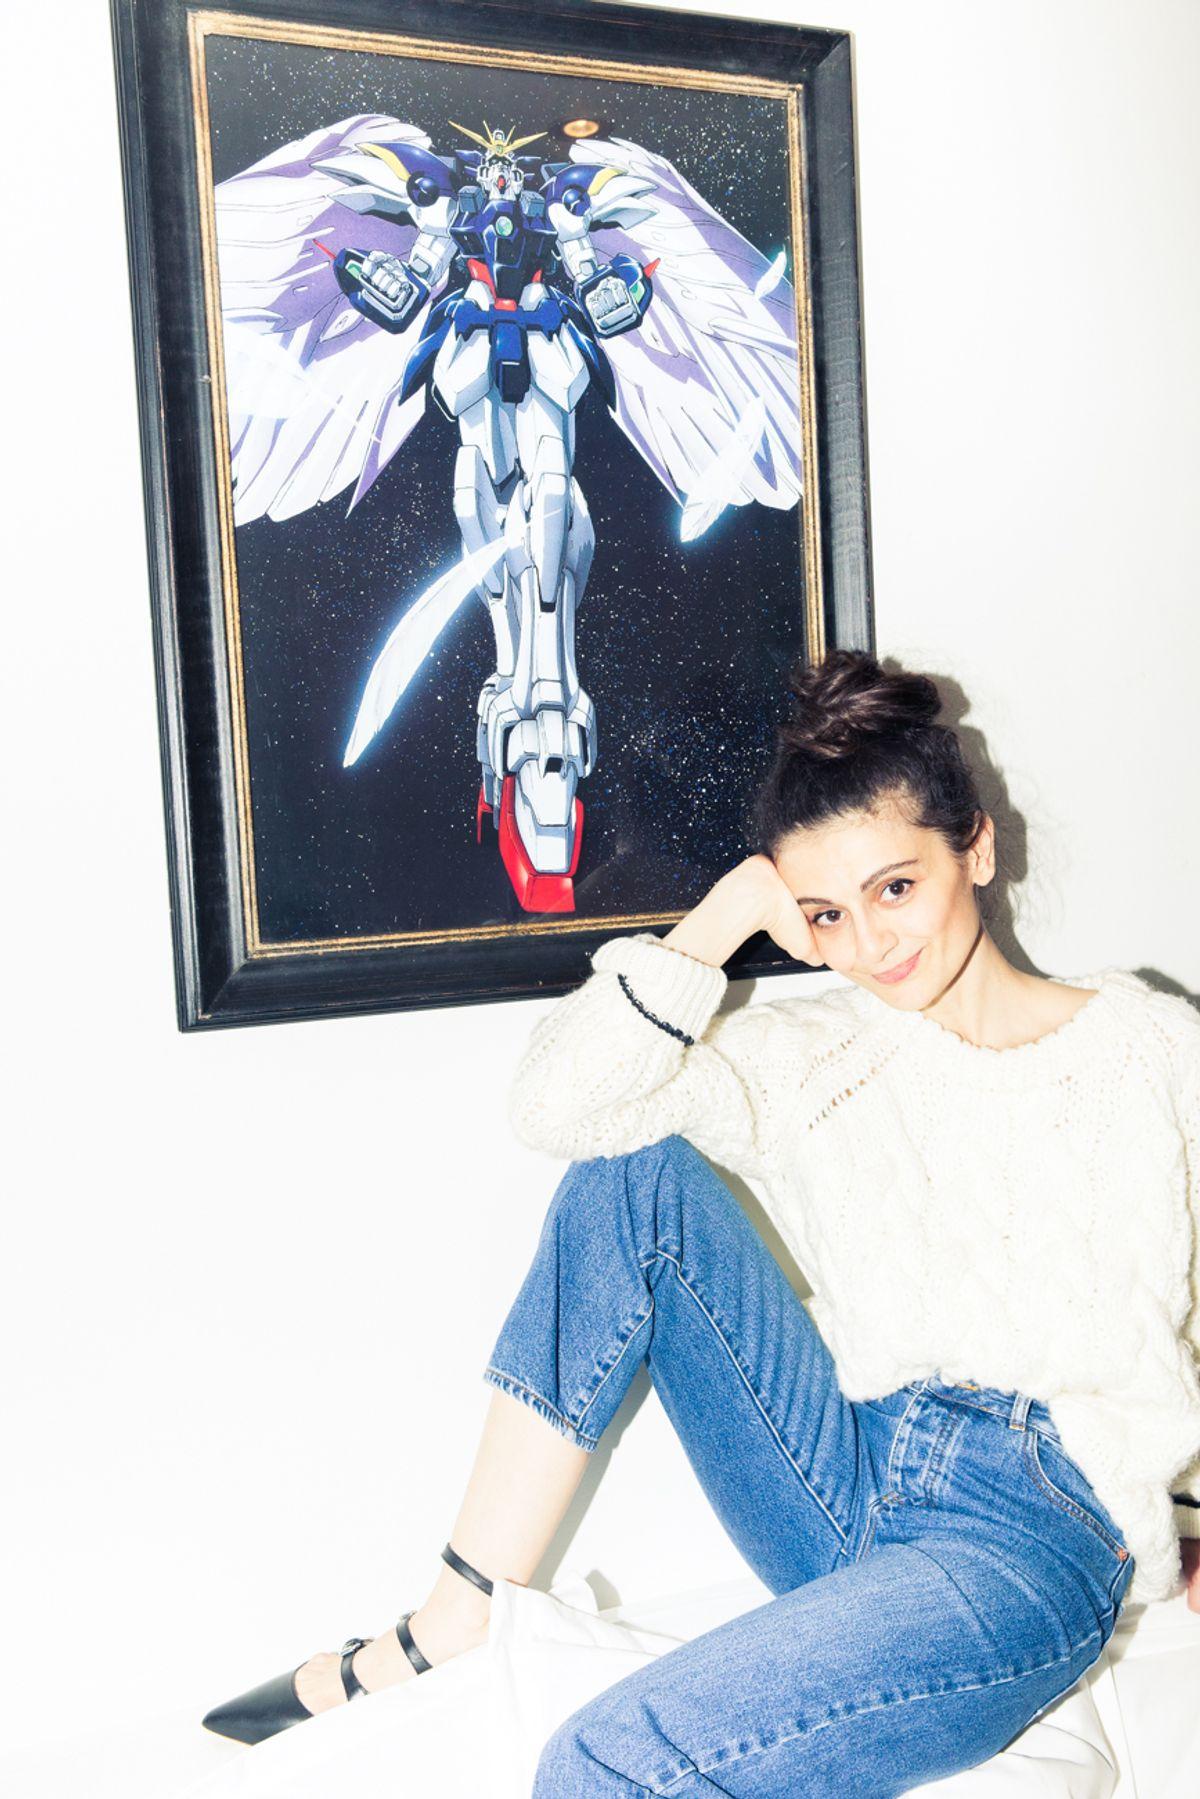 Natalia Alaverdian